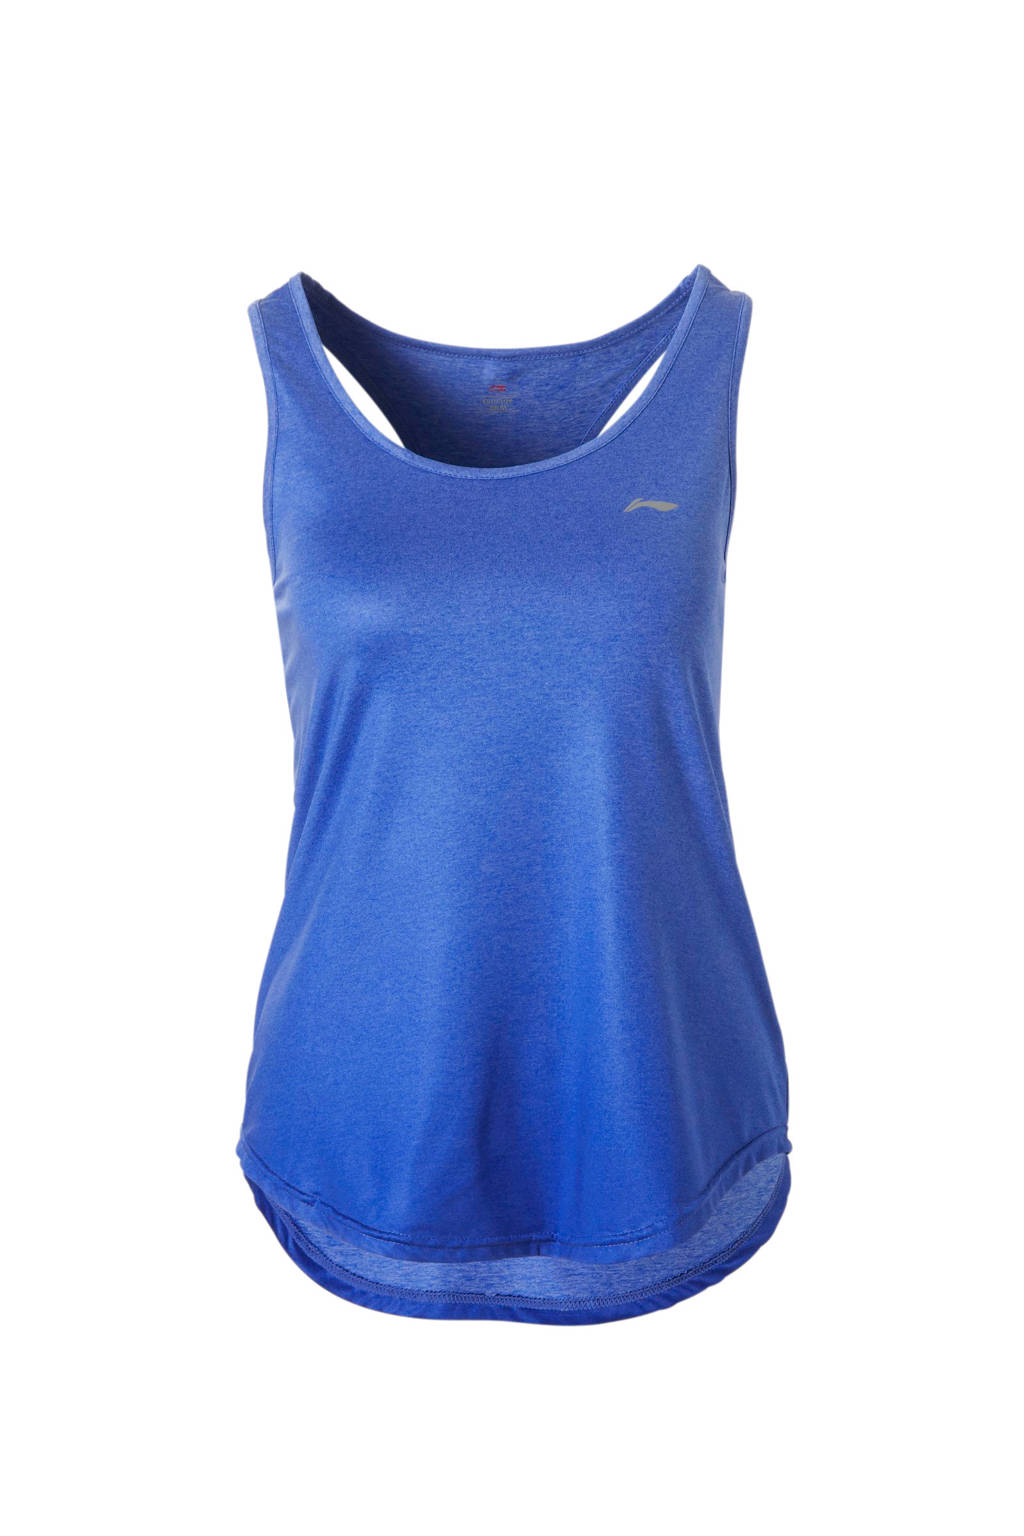 Li-Ning sporttop blauw, Blauw